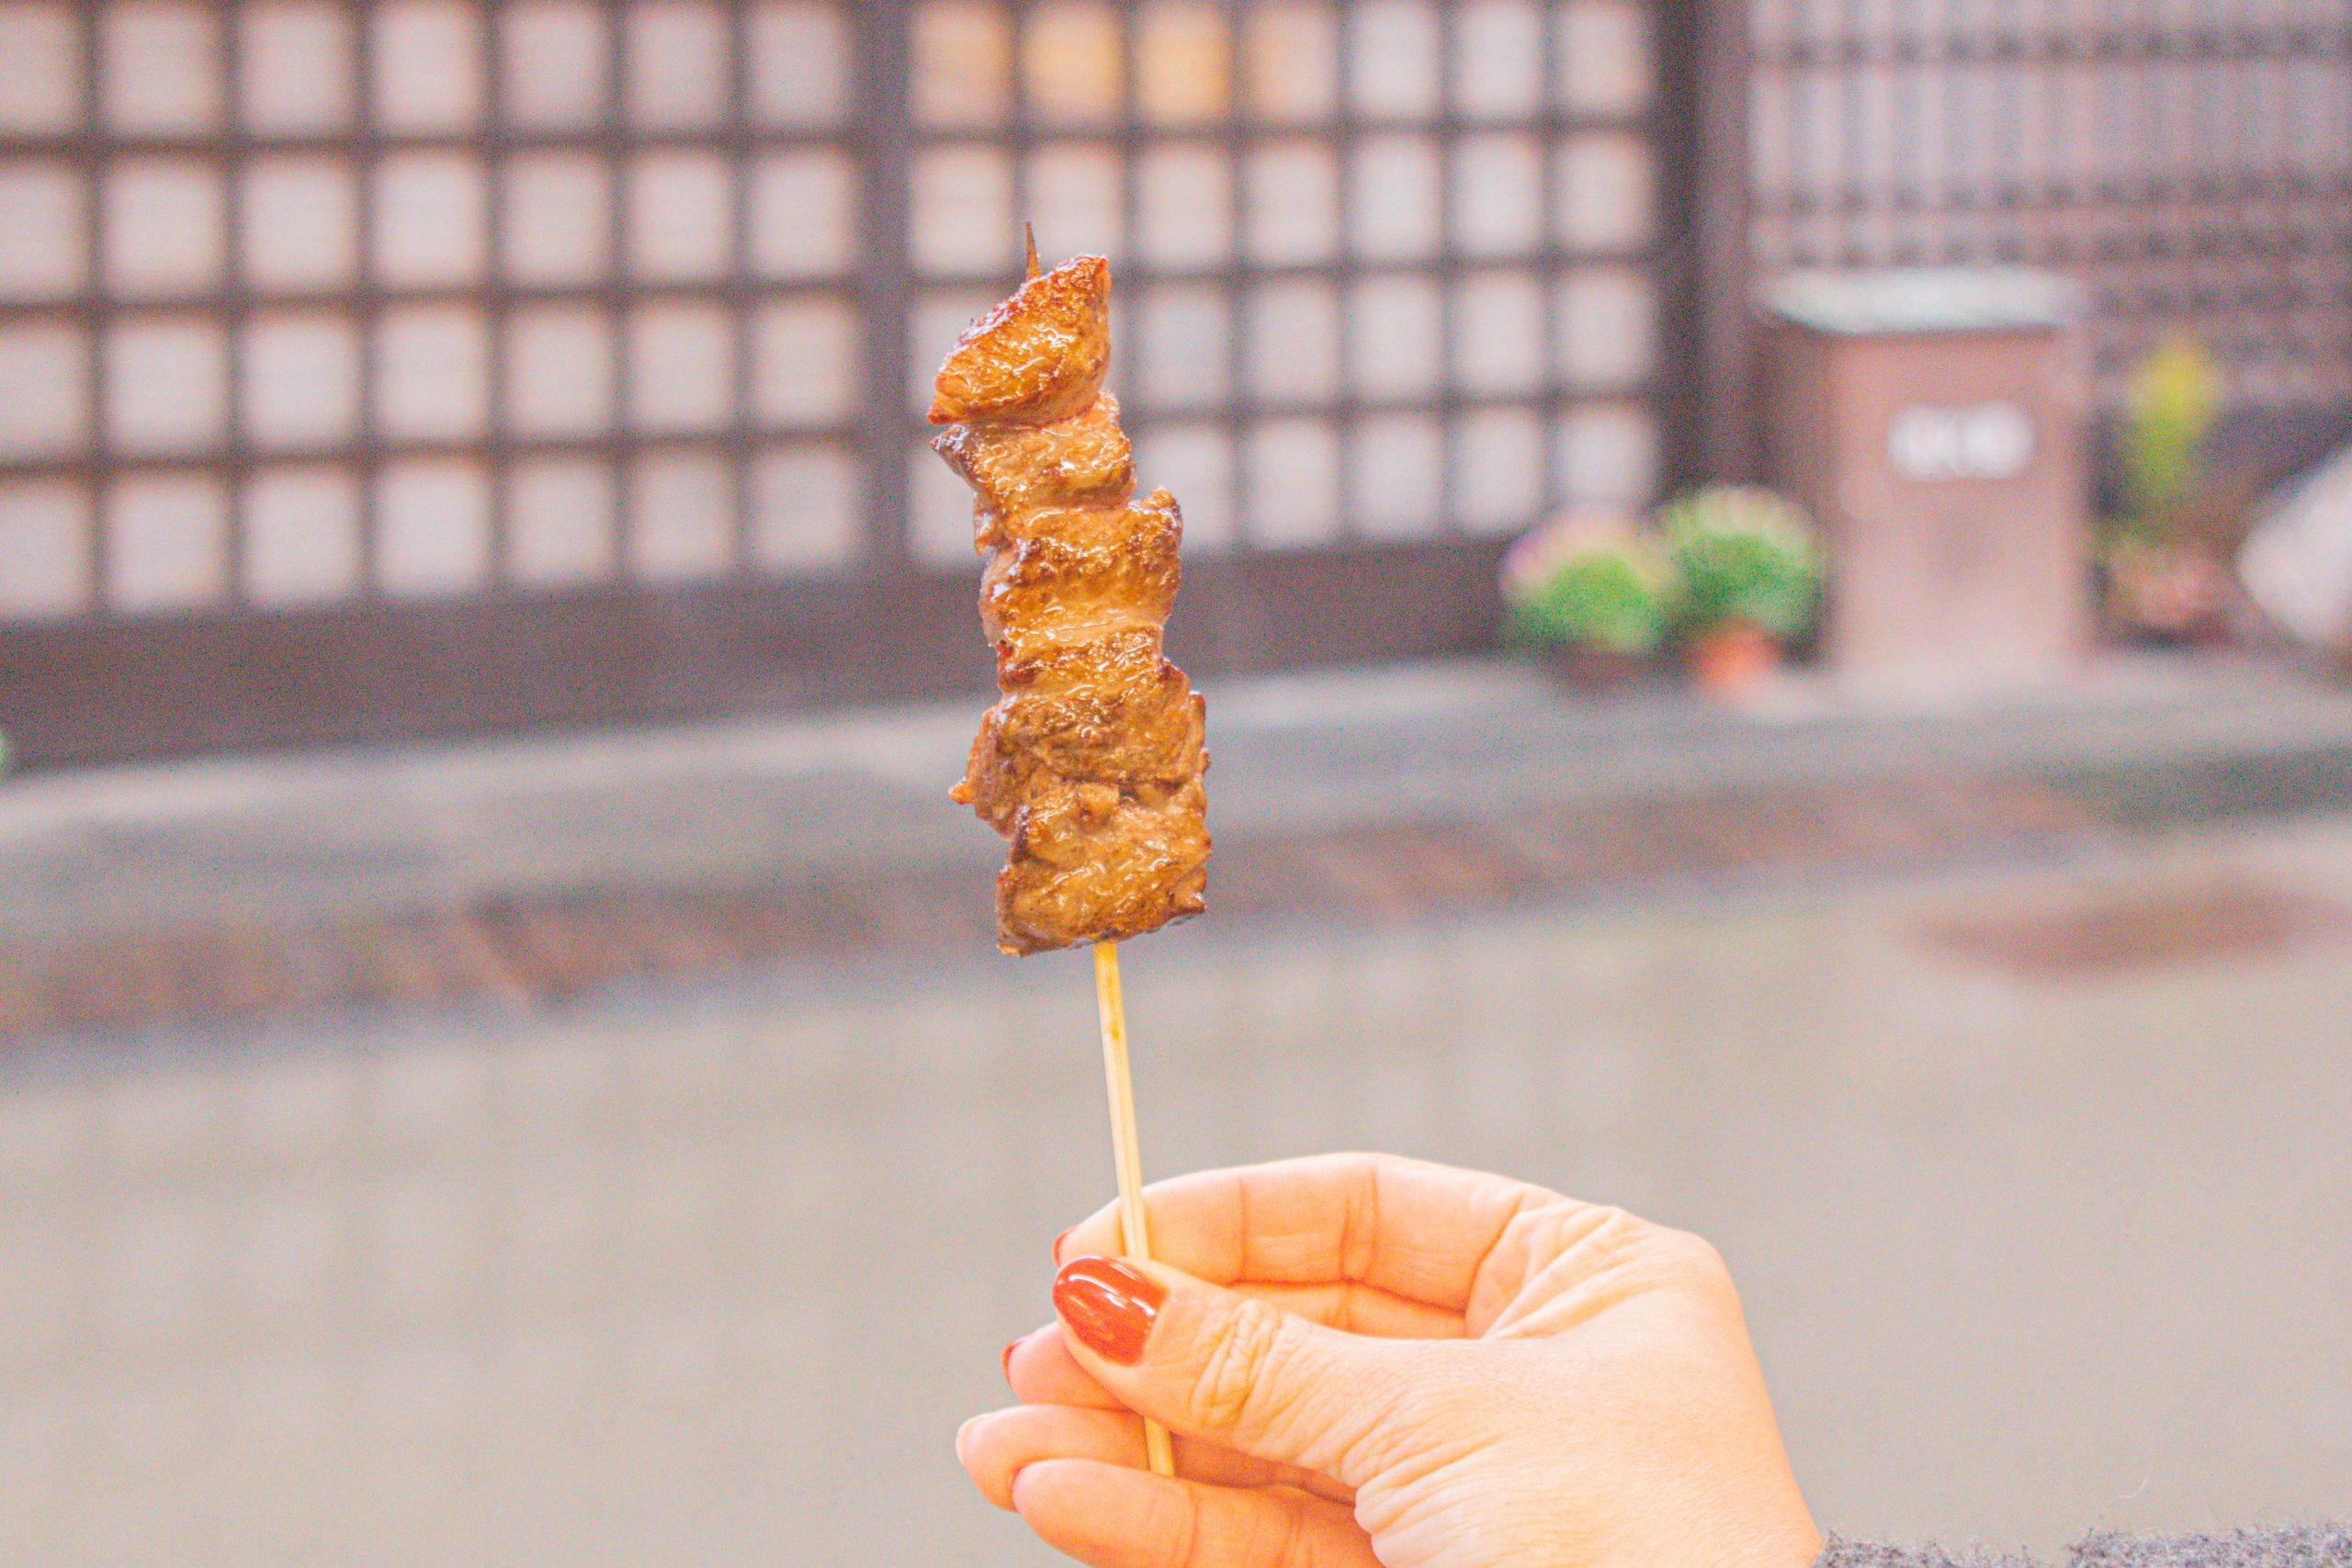 Delicious food, Beautiful Scenery: Explore Central Japan like a Local with the Takayama-Hokuriku Area Tourist Pass! [Part 1] - Alvinology